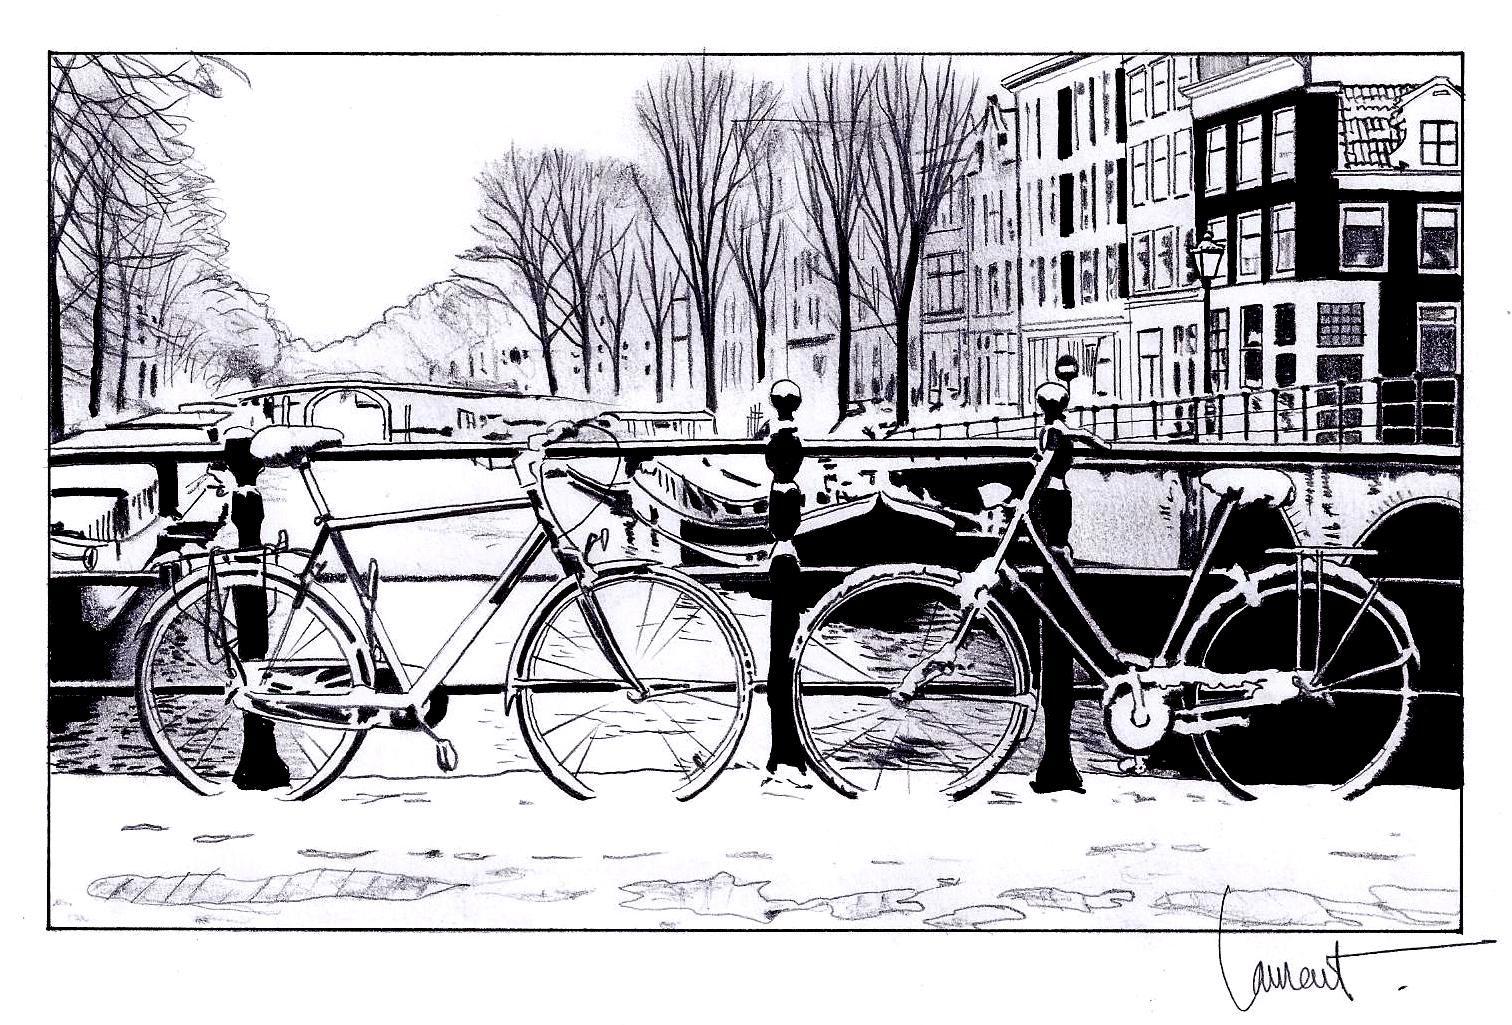 13_03_28_Amsterdam_C_001